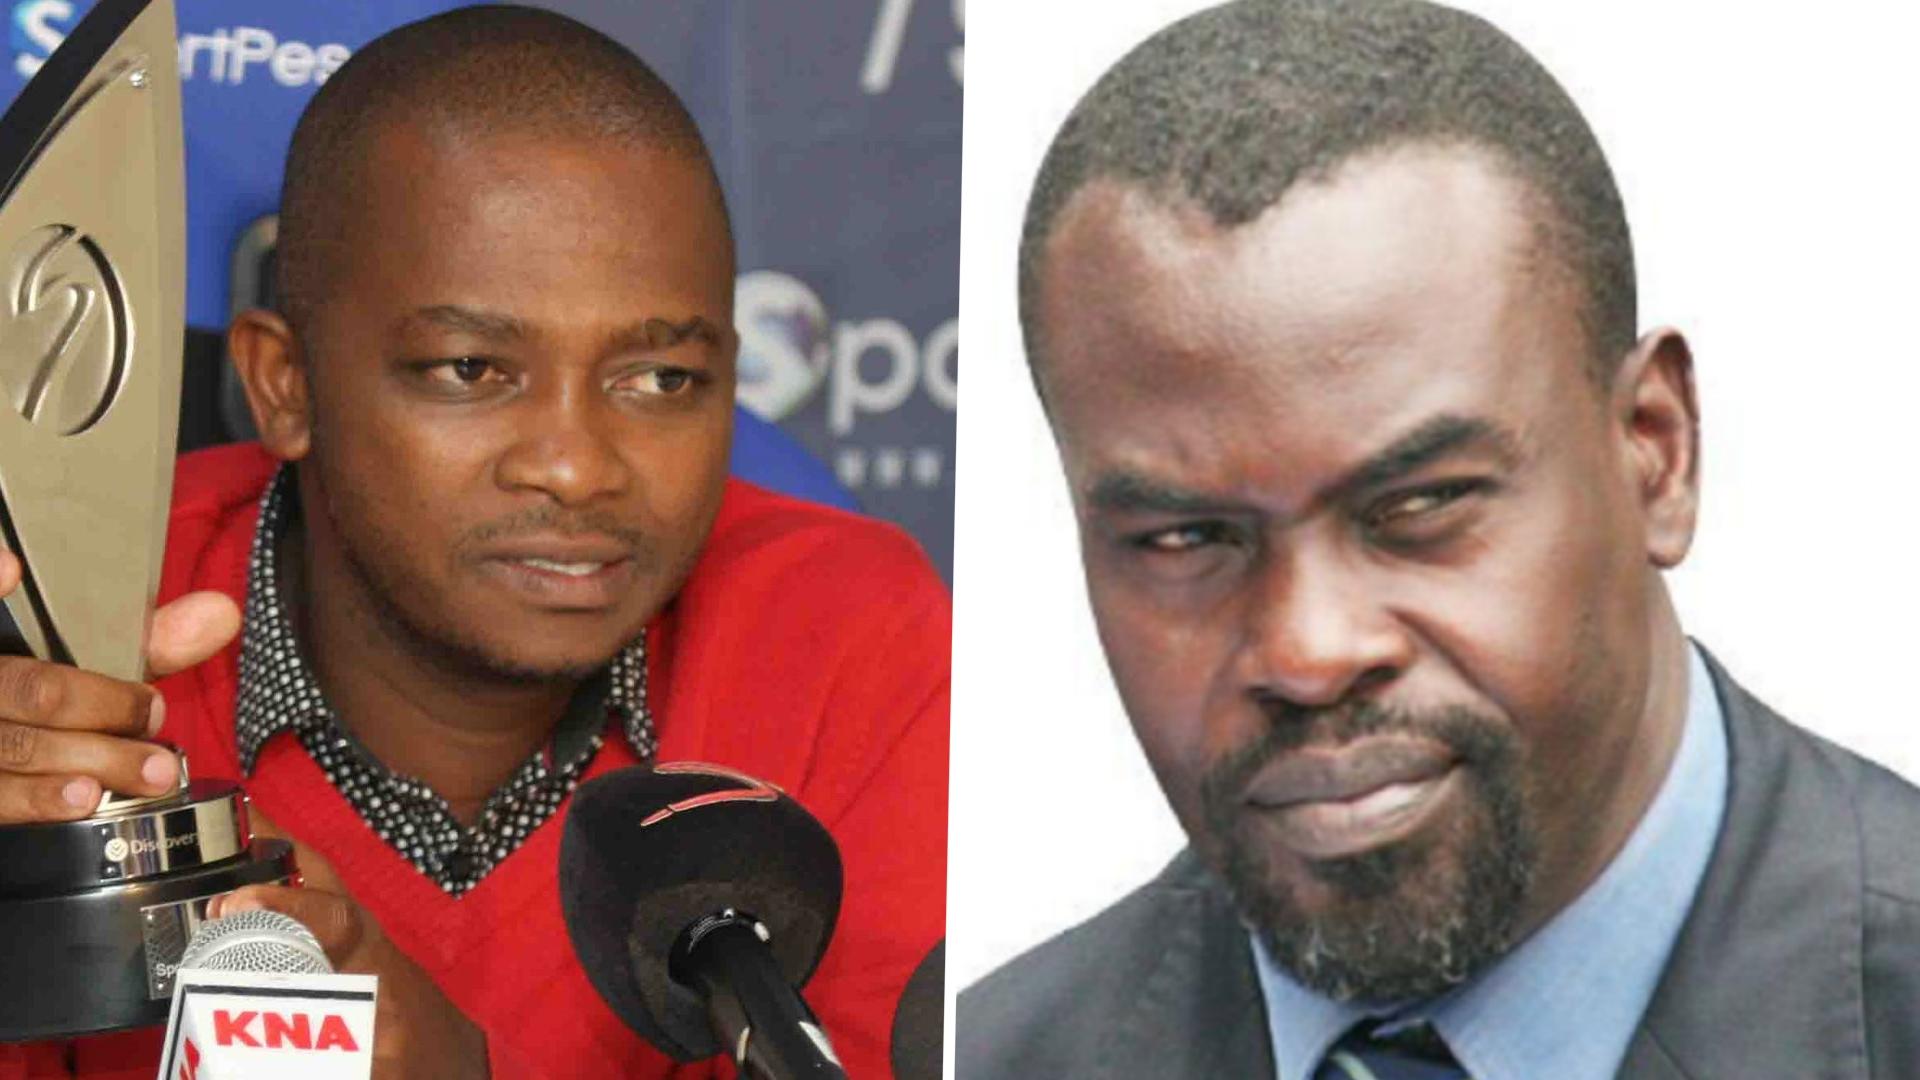 FKF has seen improvements under Mwendwa - Aduda